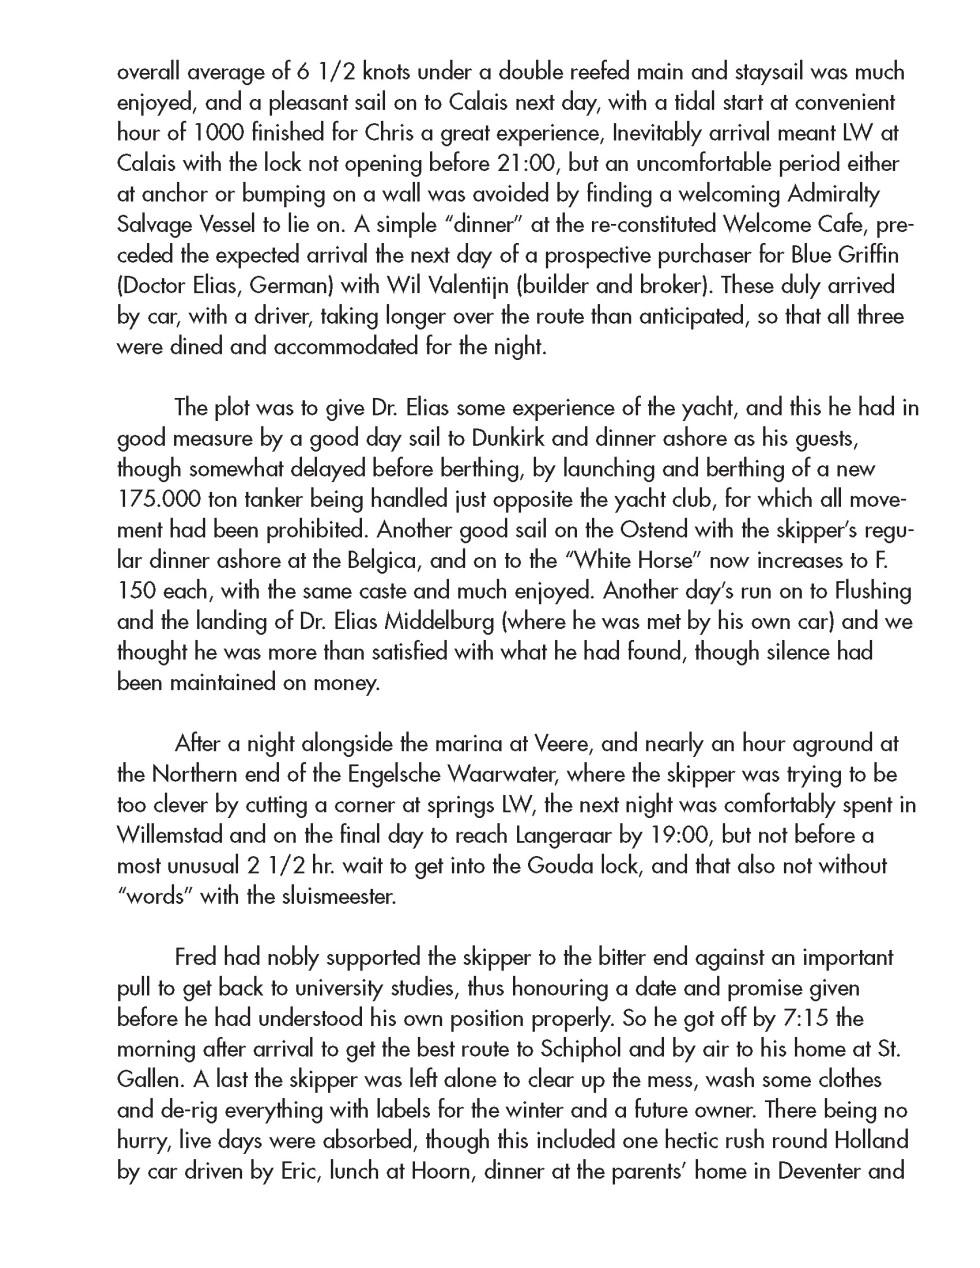 Narrative1971_Page_18